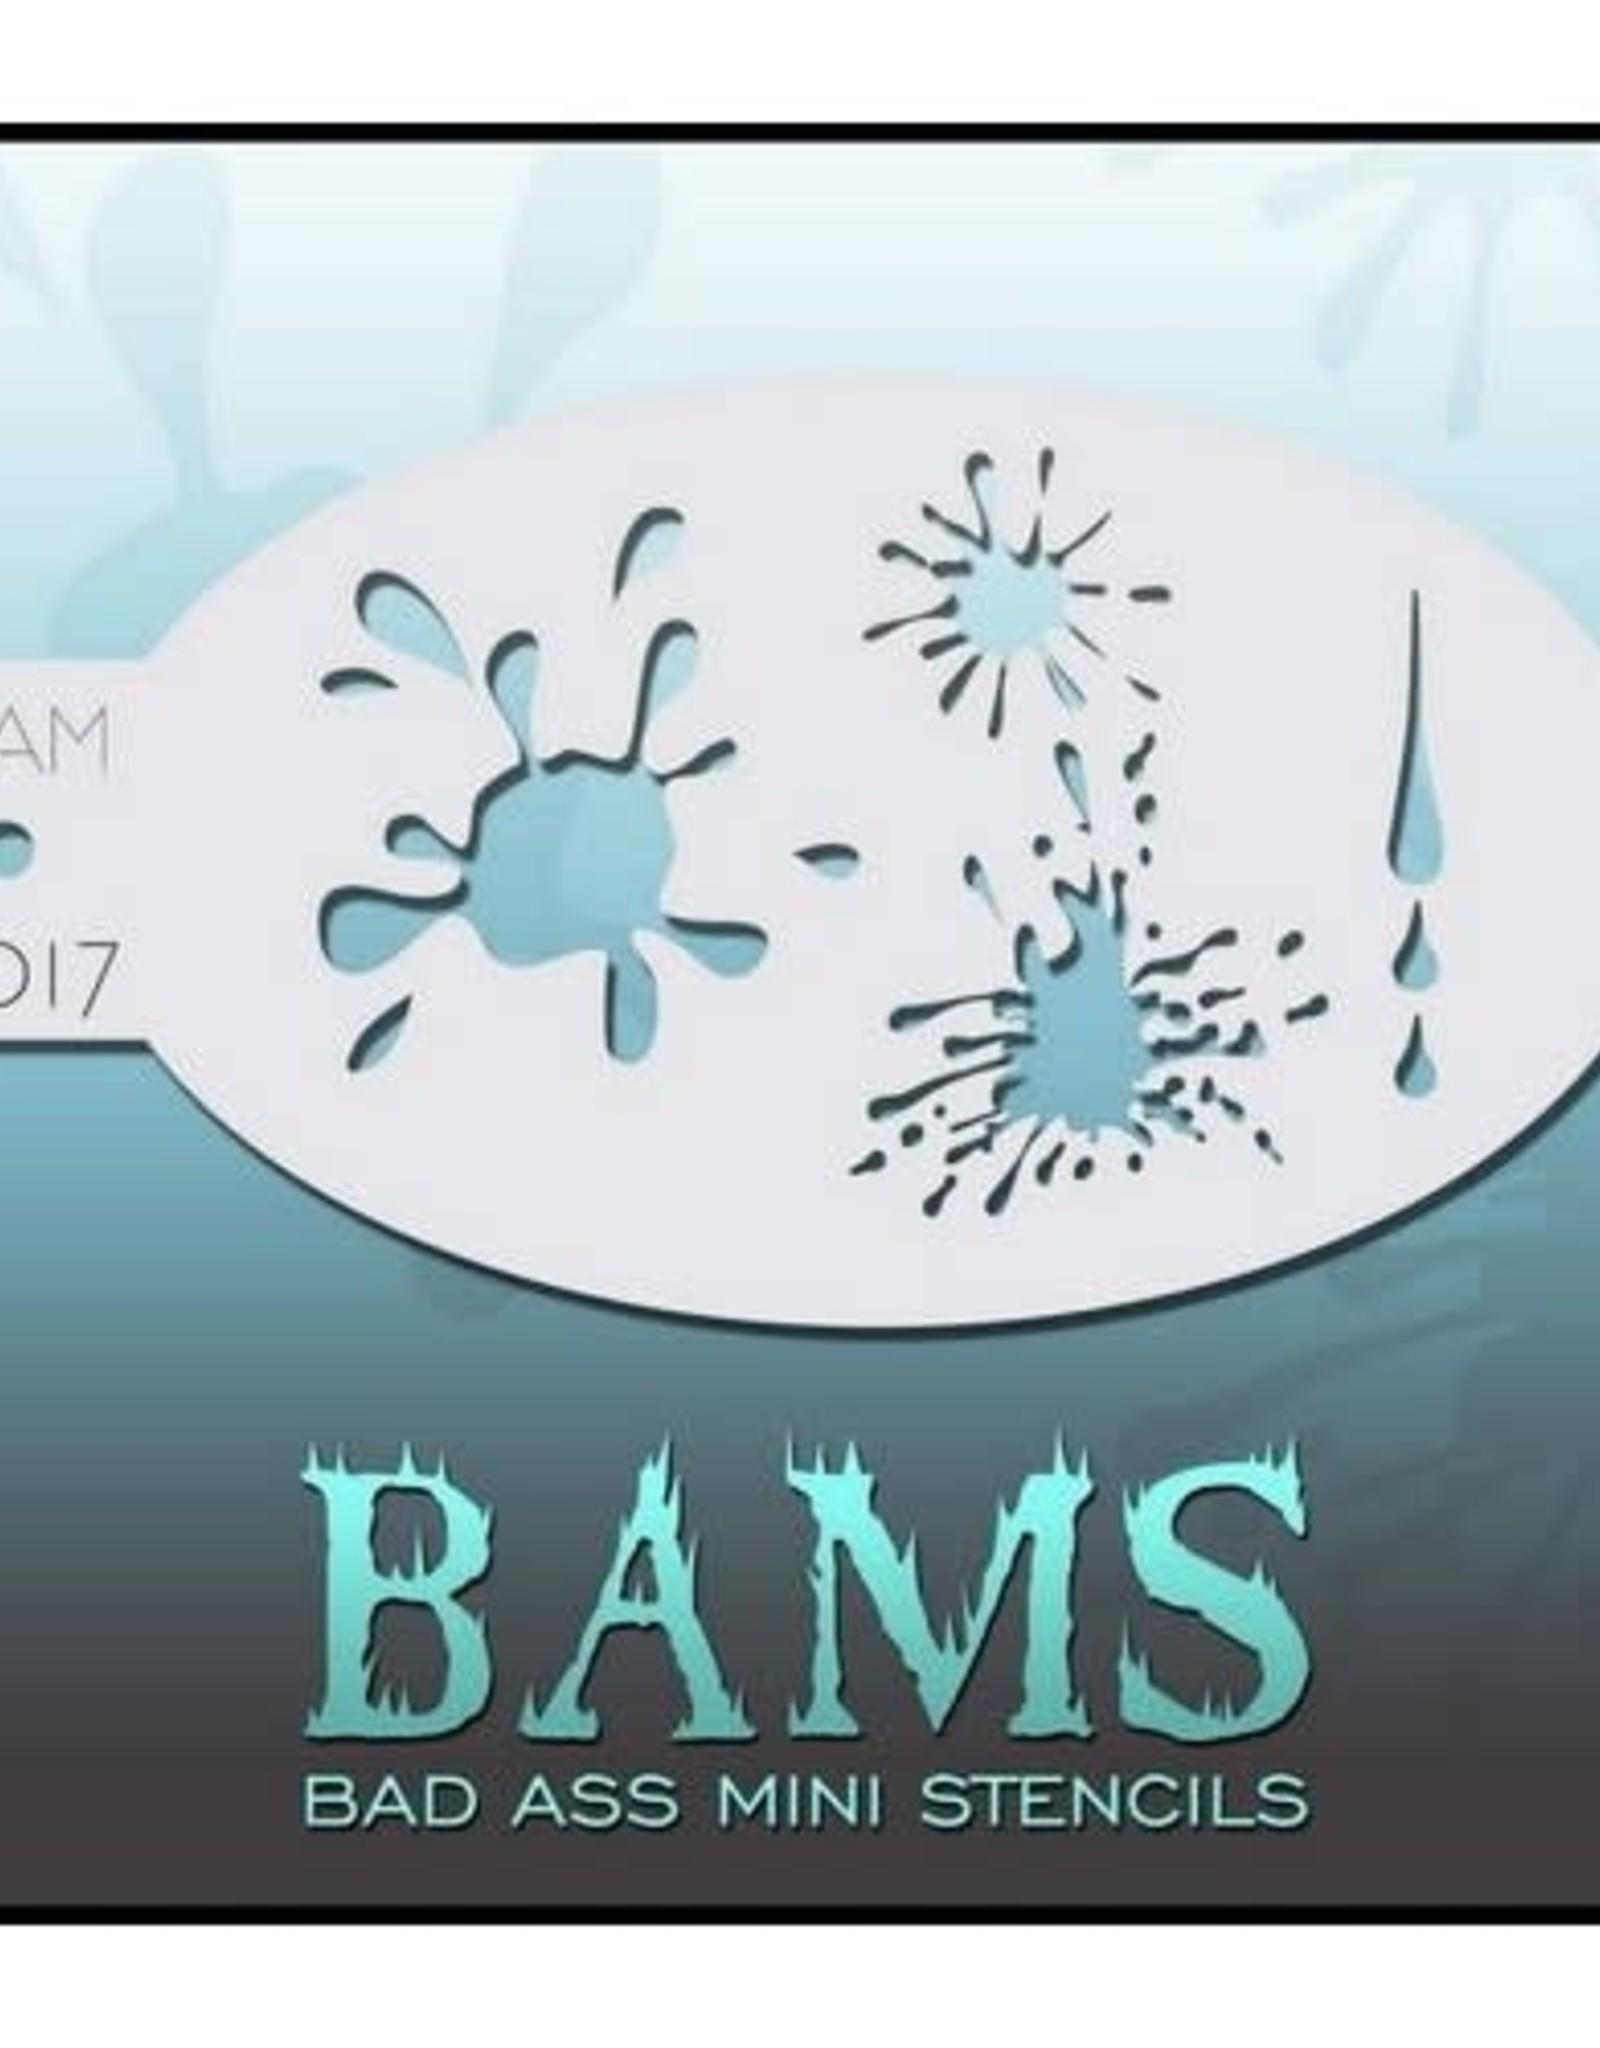 Bad Ass Stencils Bad Ass Mini Stencil - BAM1017